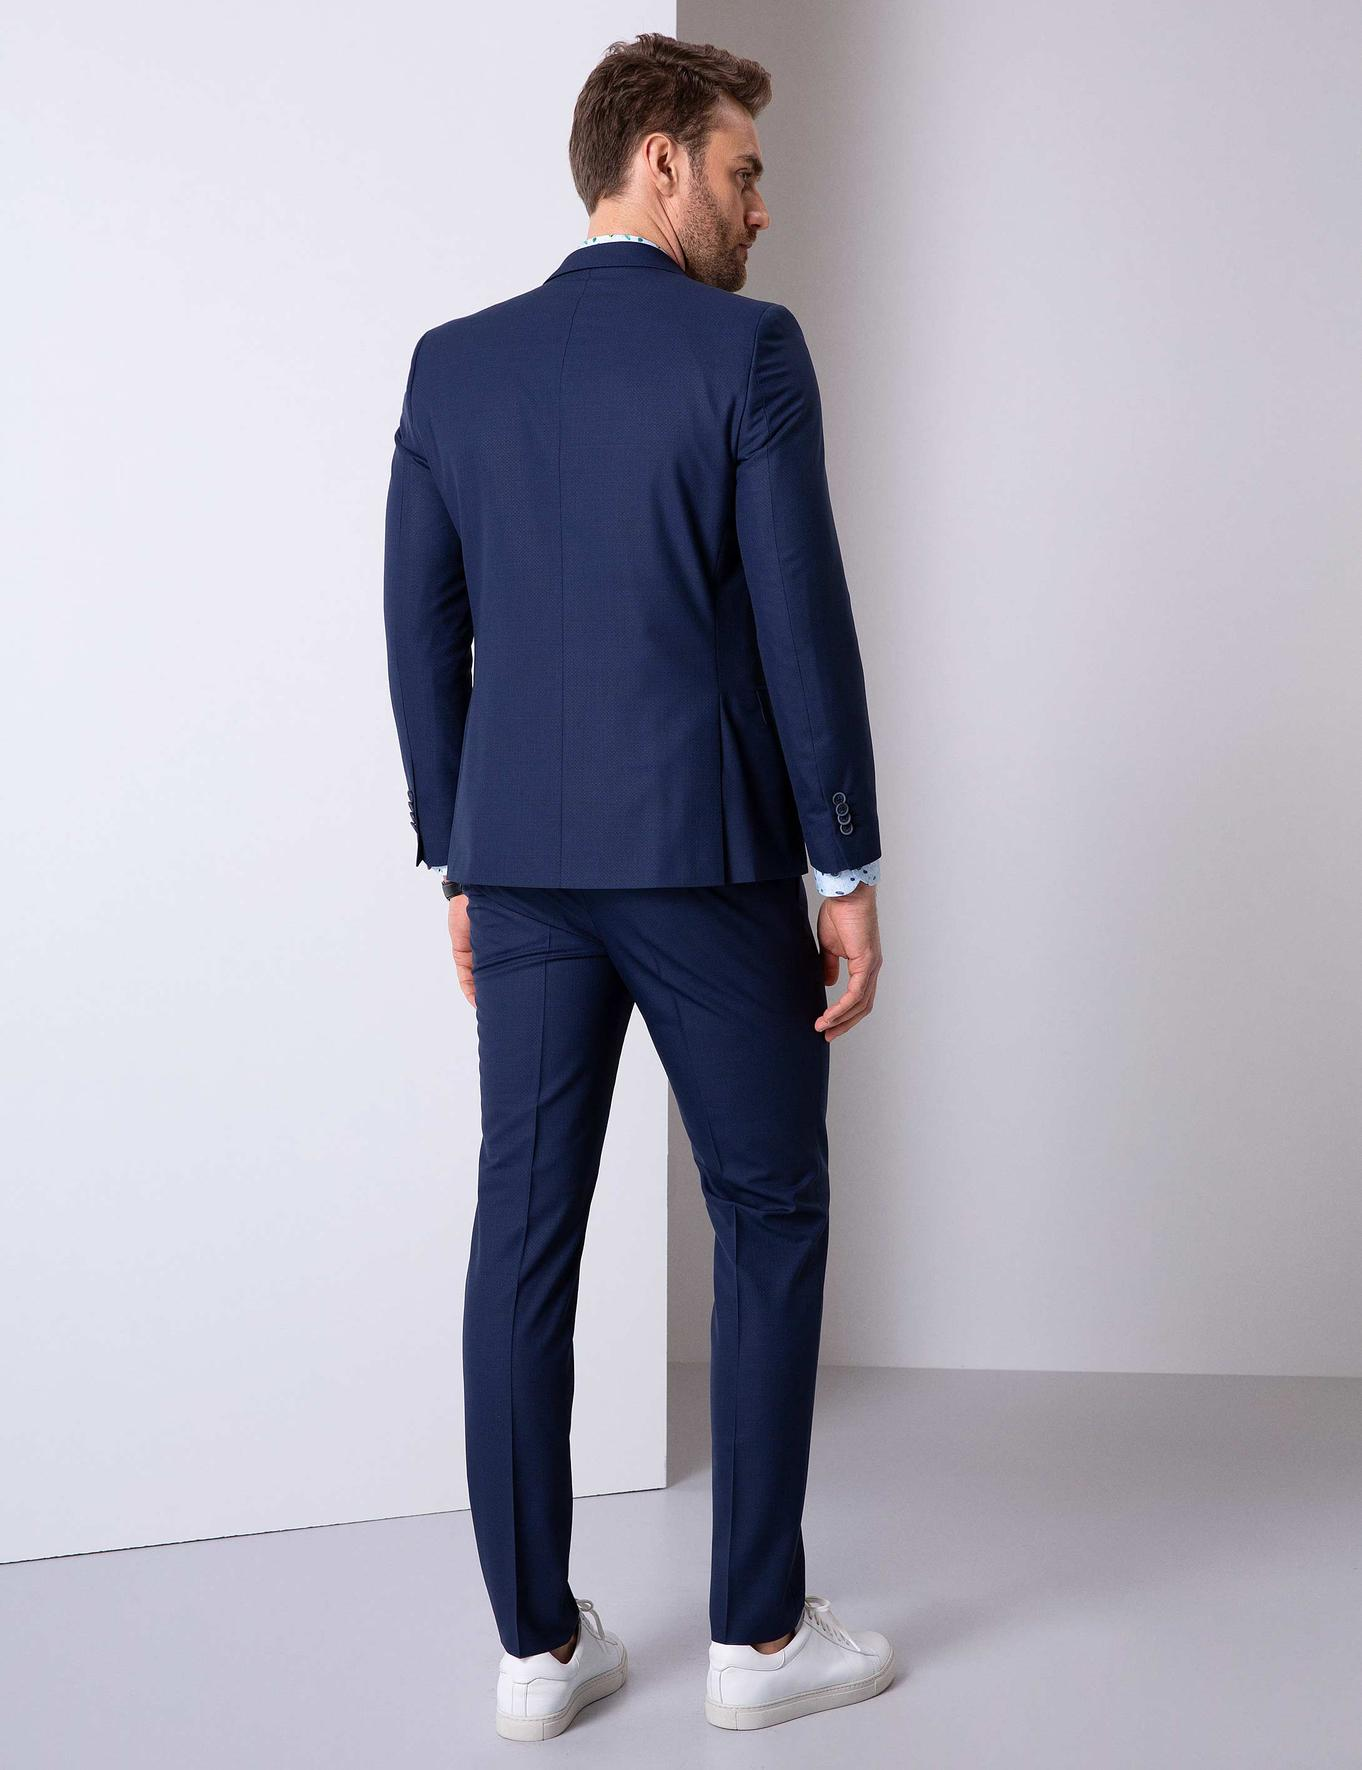 Açık Lacivert Ekstra Slim Fit Takım Elbise